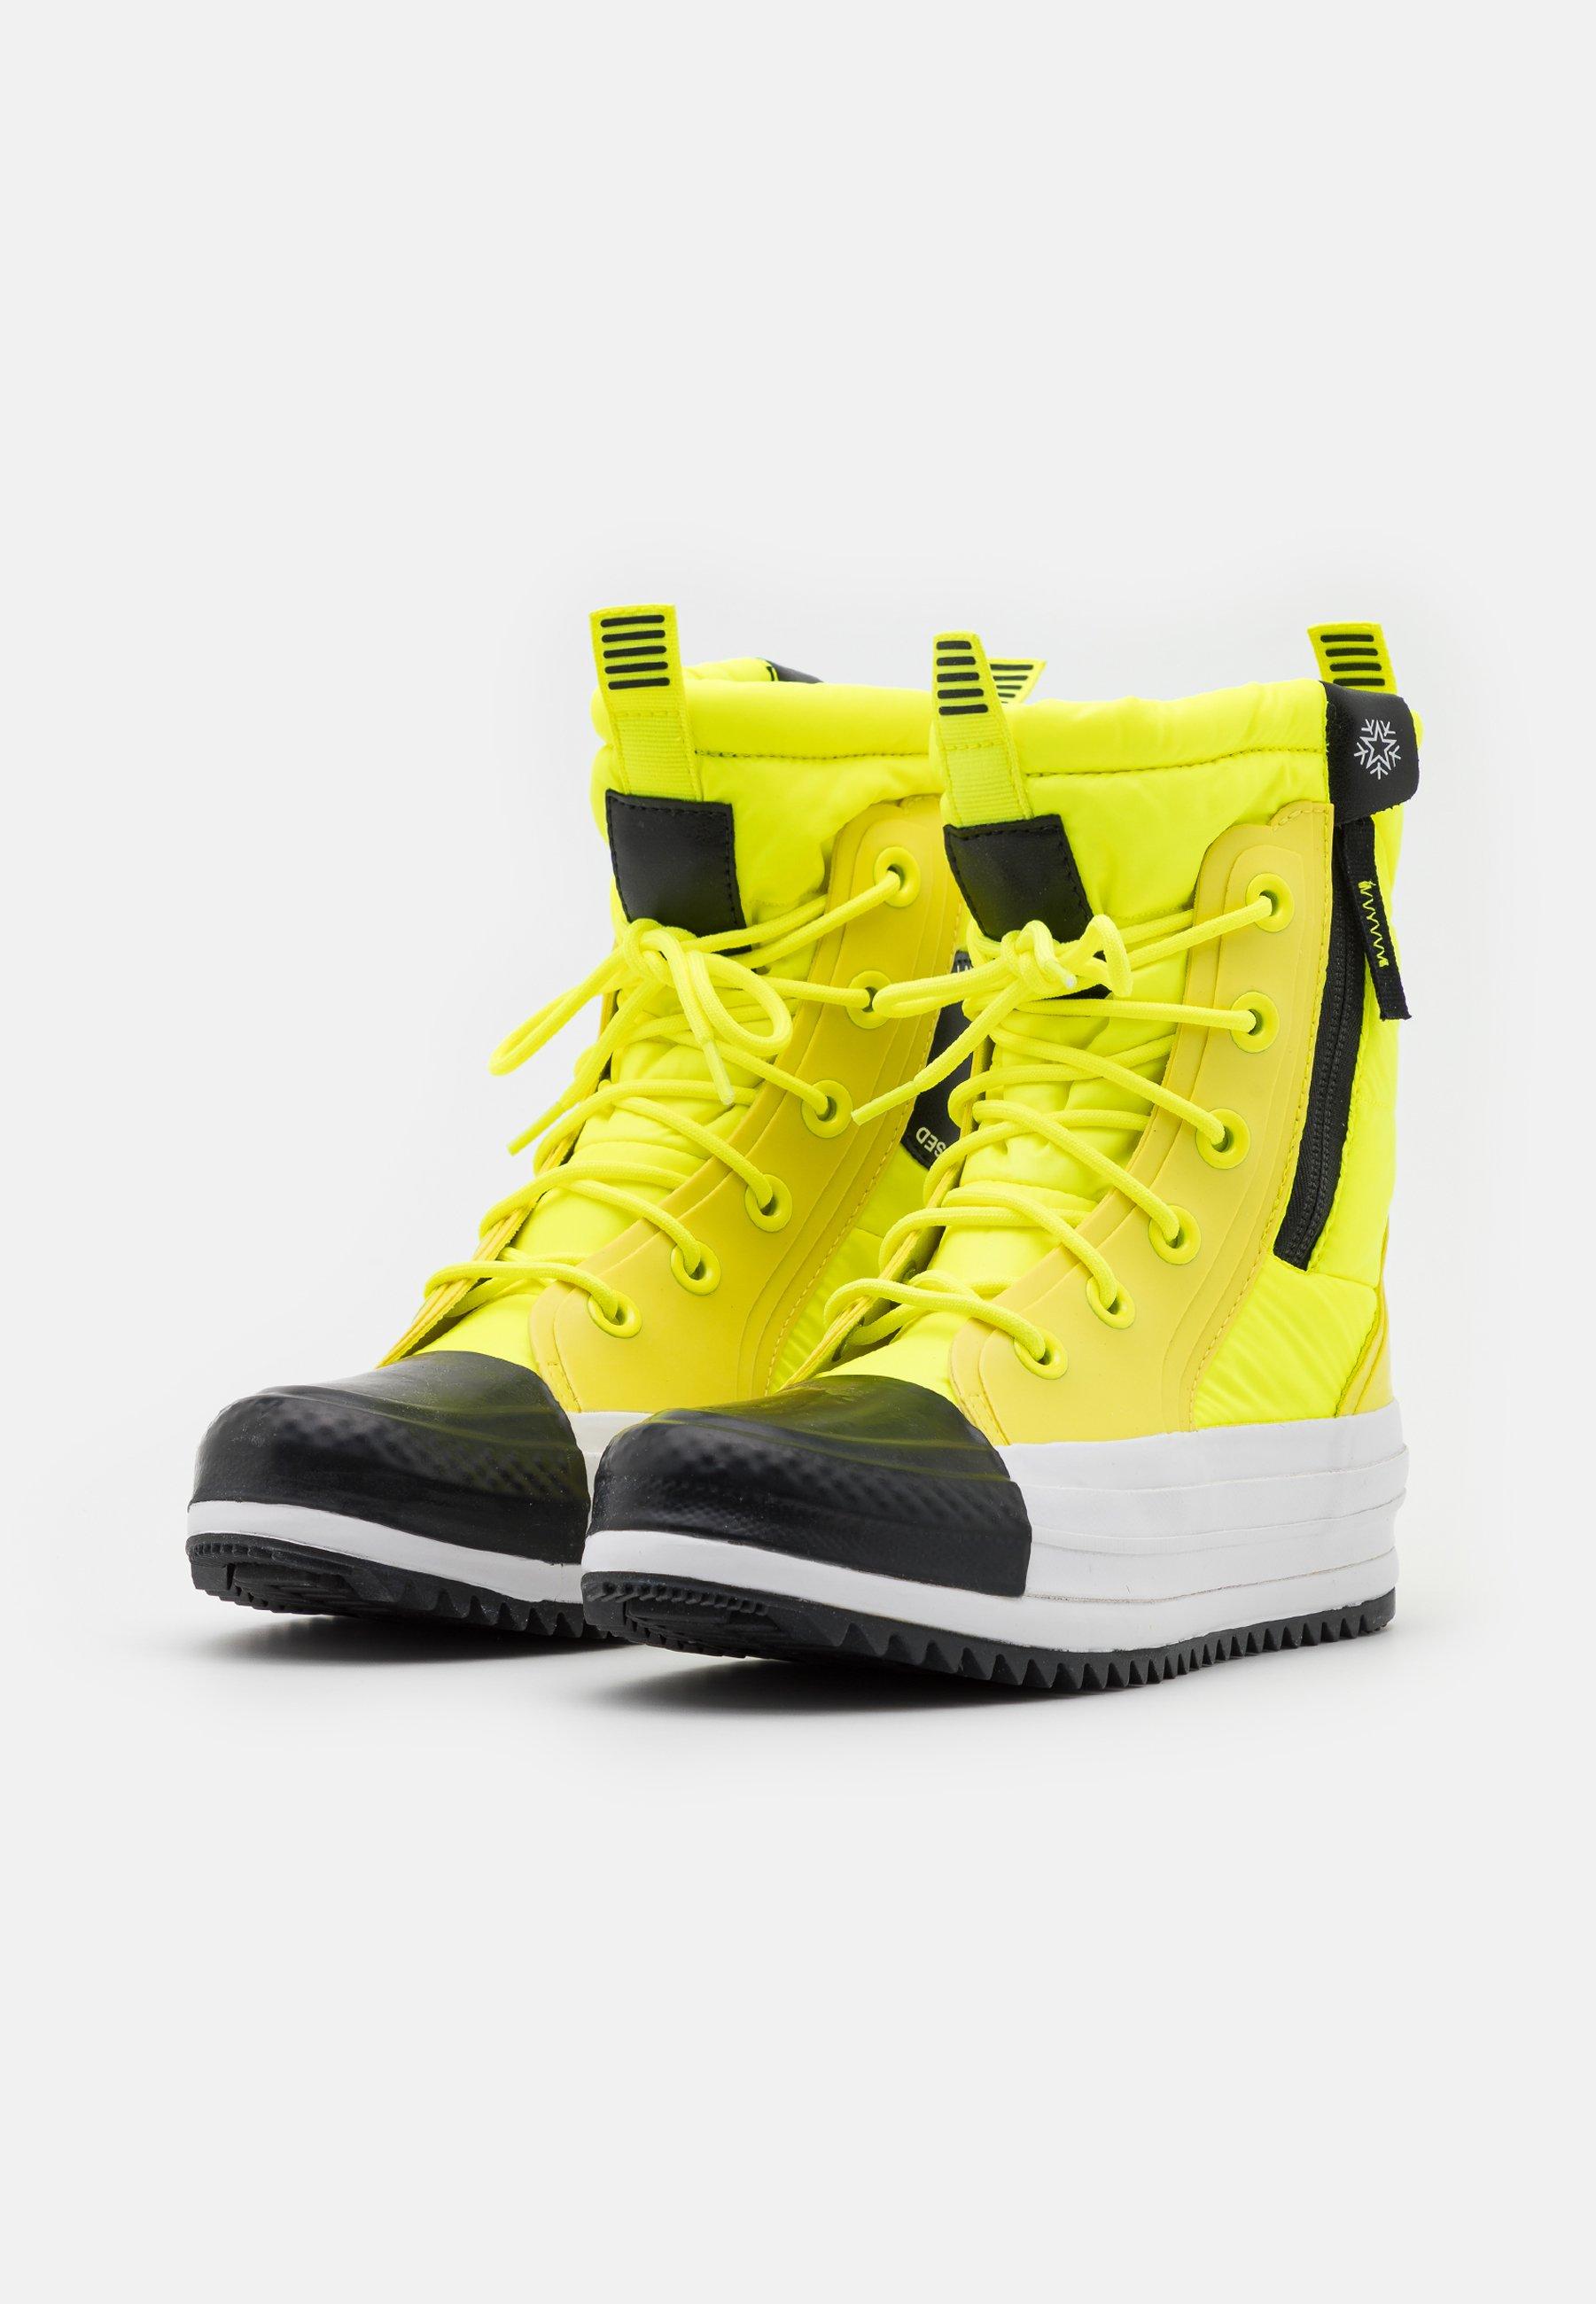 Converse CHUCK TAYLOR ALL STAR BOOT Snowboot/Winterstiefel lemon/black/white/neongelb